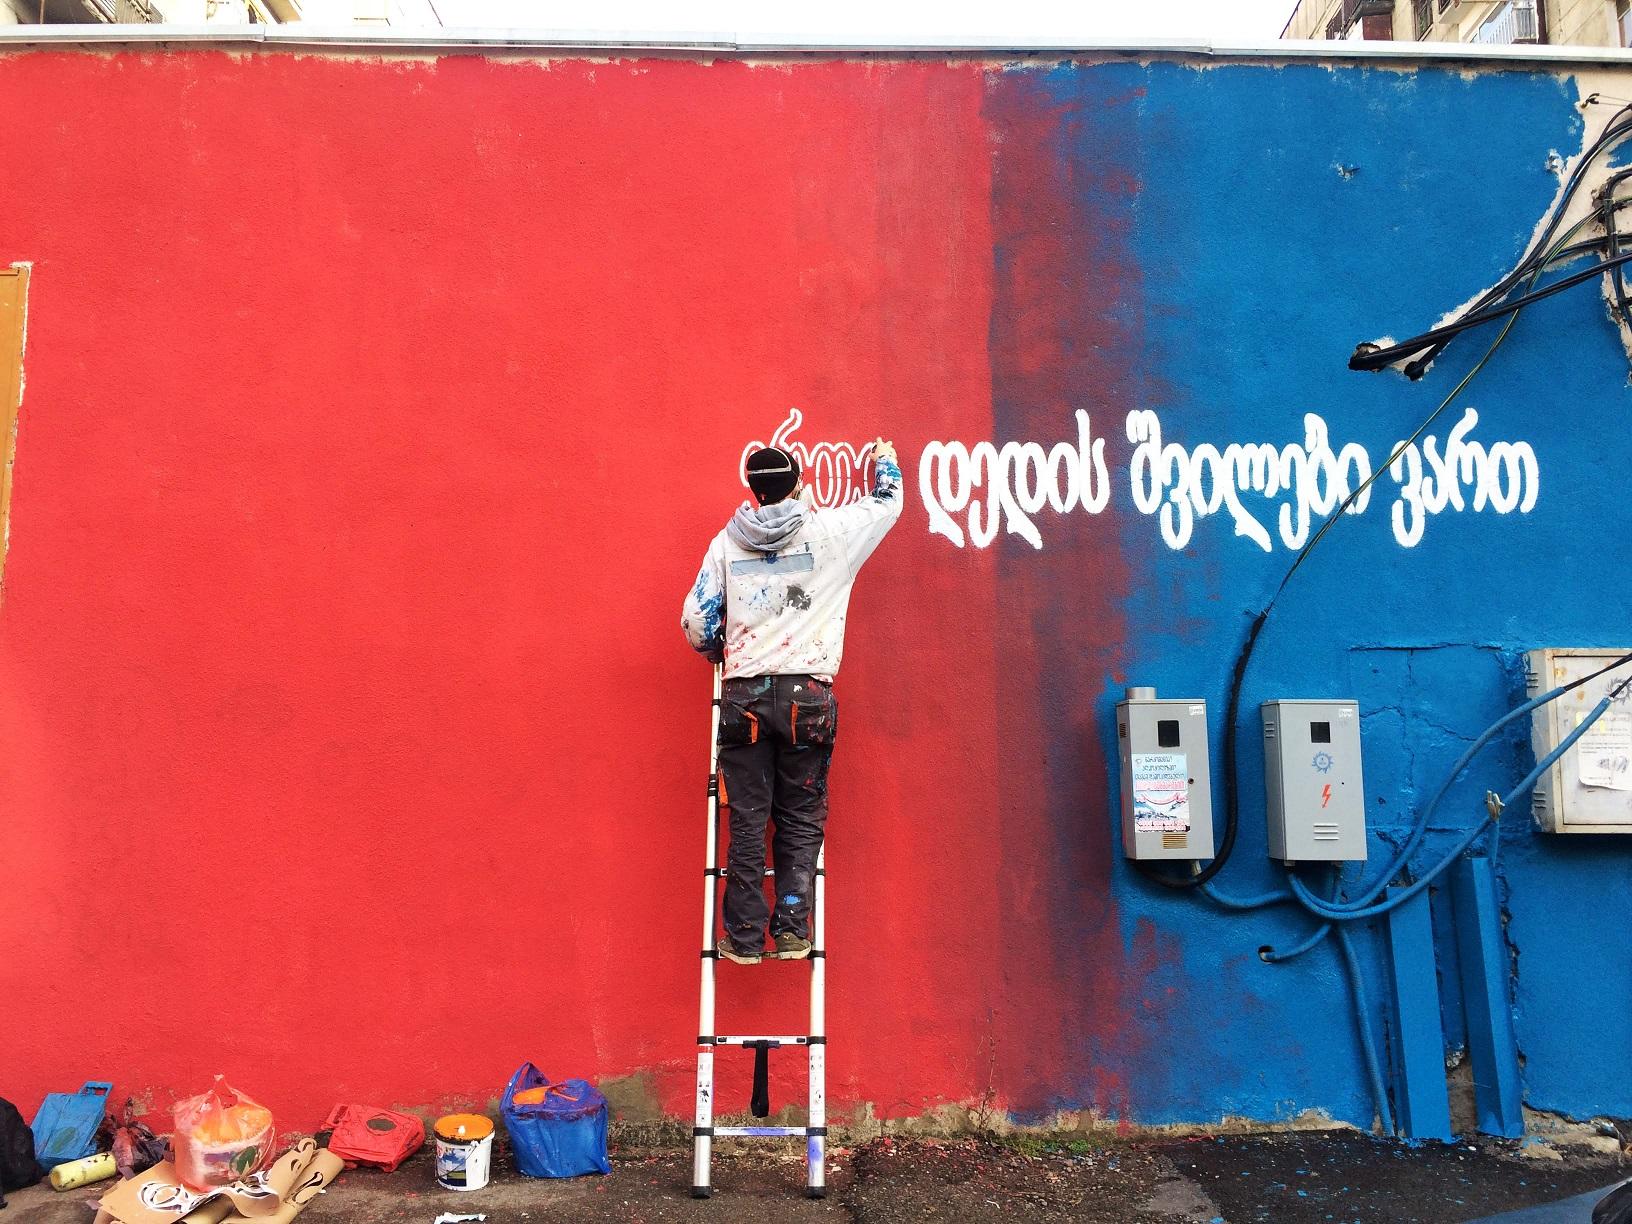 3 #art featured, арт, Бразилия, германия, граффити, Грузия, Дино Бенто, искусство, Лапиз, мурал, Саша Корбан, стрит-арт, тбилиси, украина